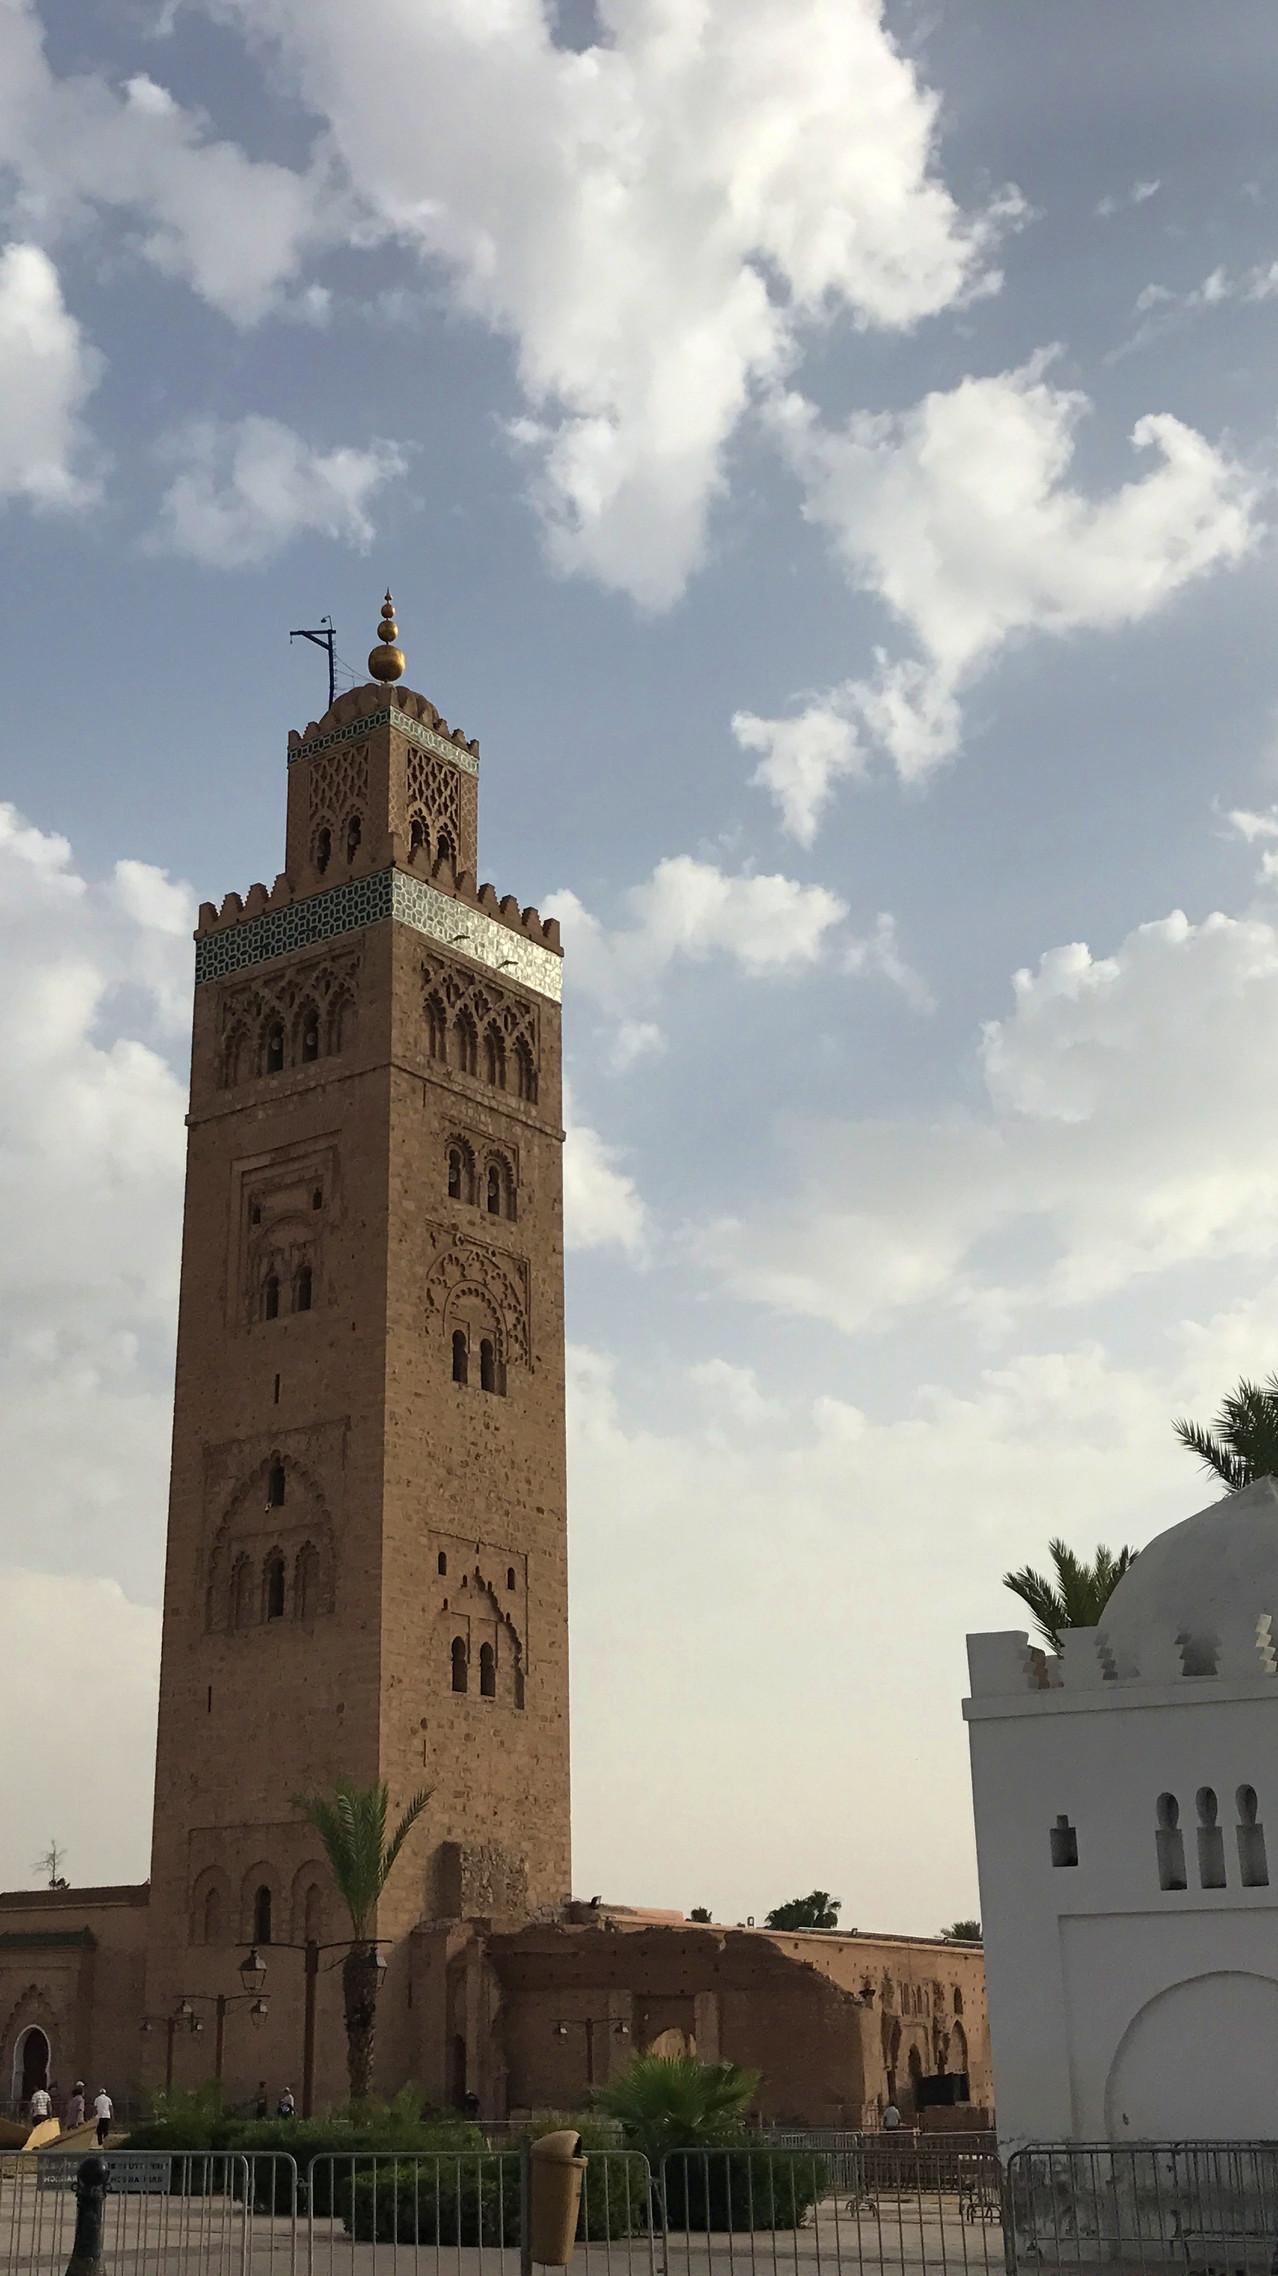 Minarete de la mezquita Koutoubia en Marrakech